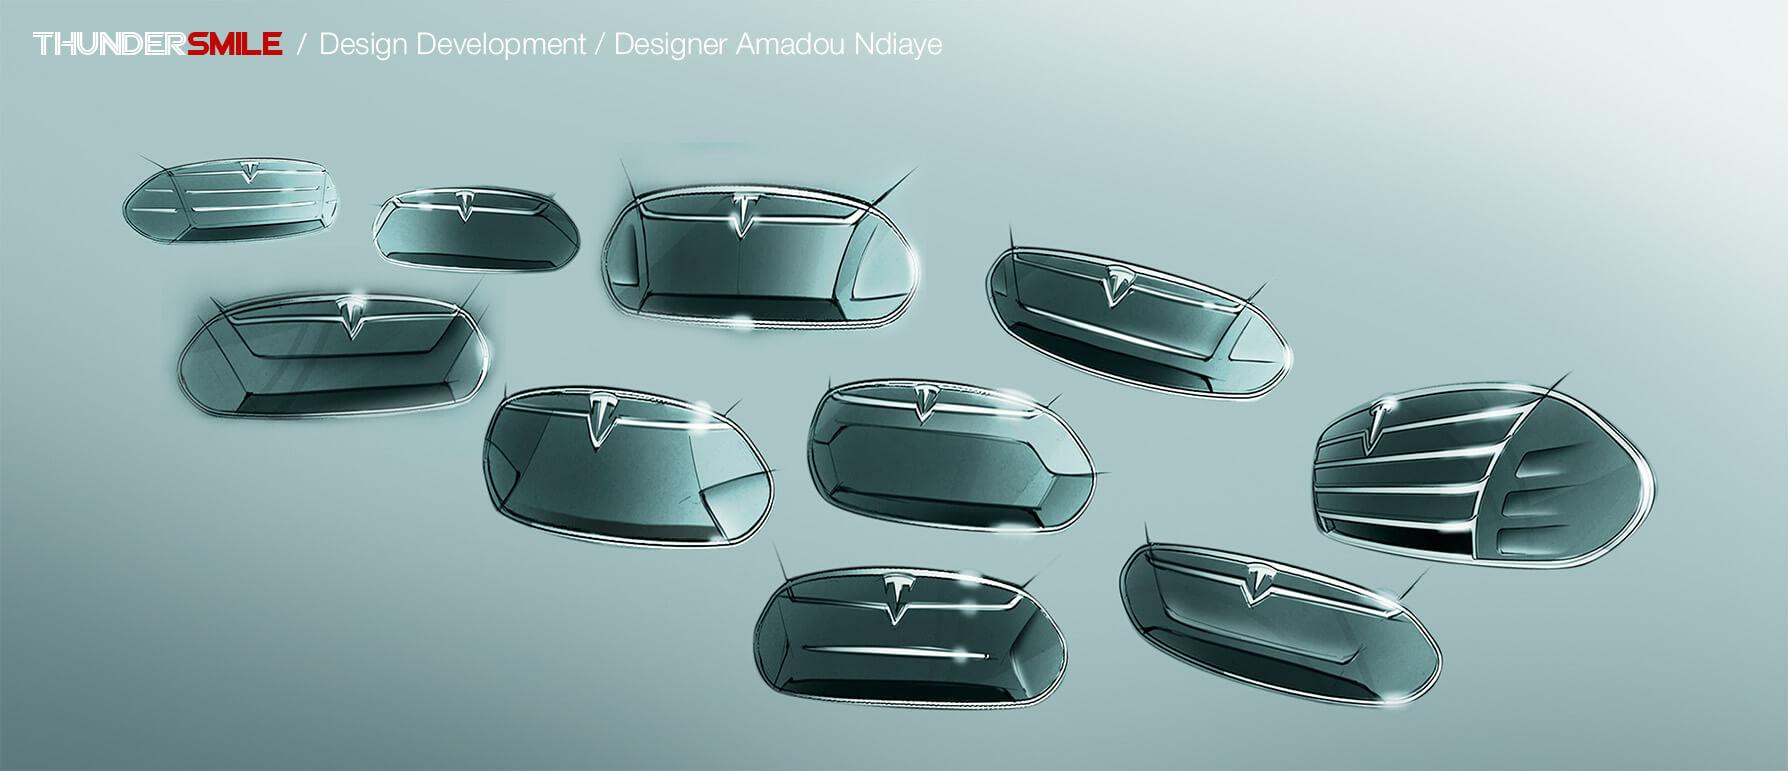 thundersmile-design-development-amadou